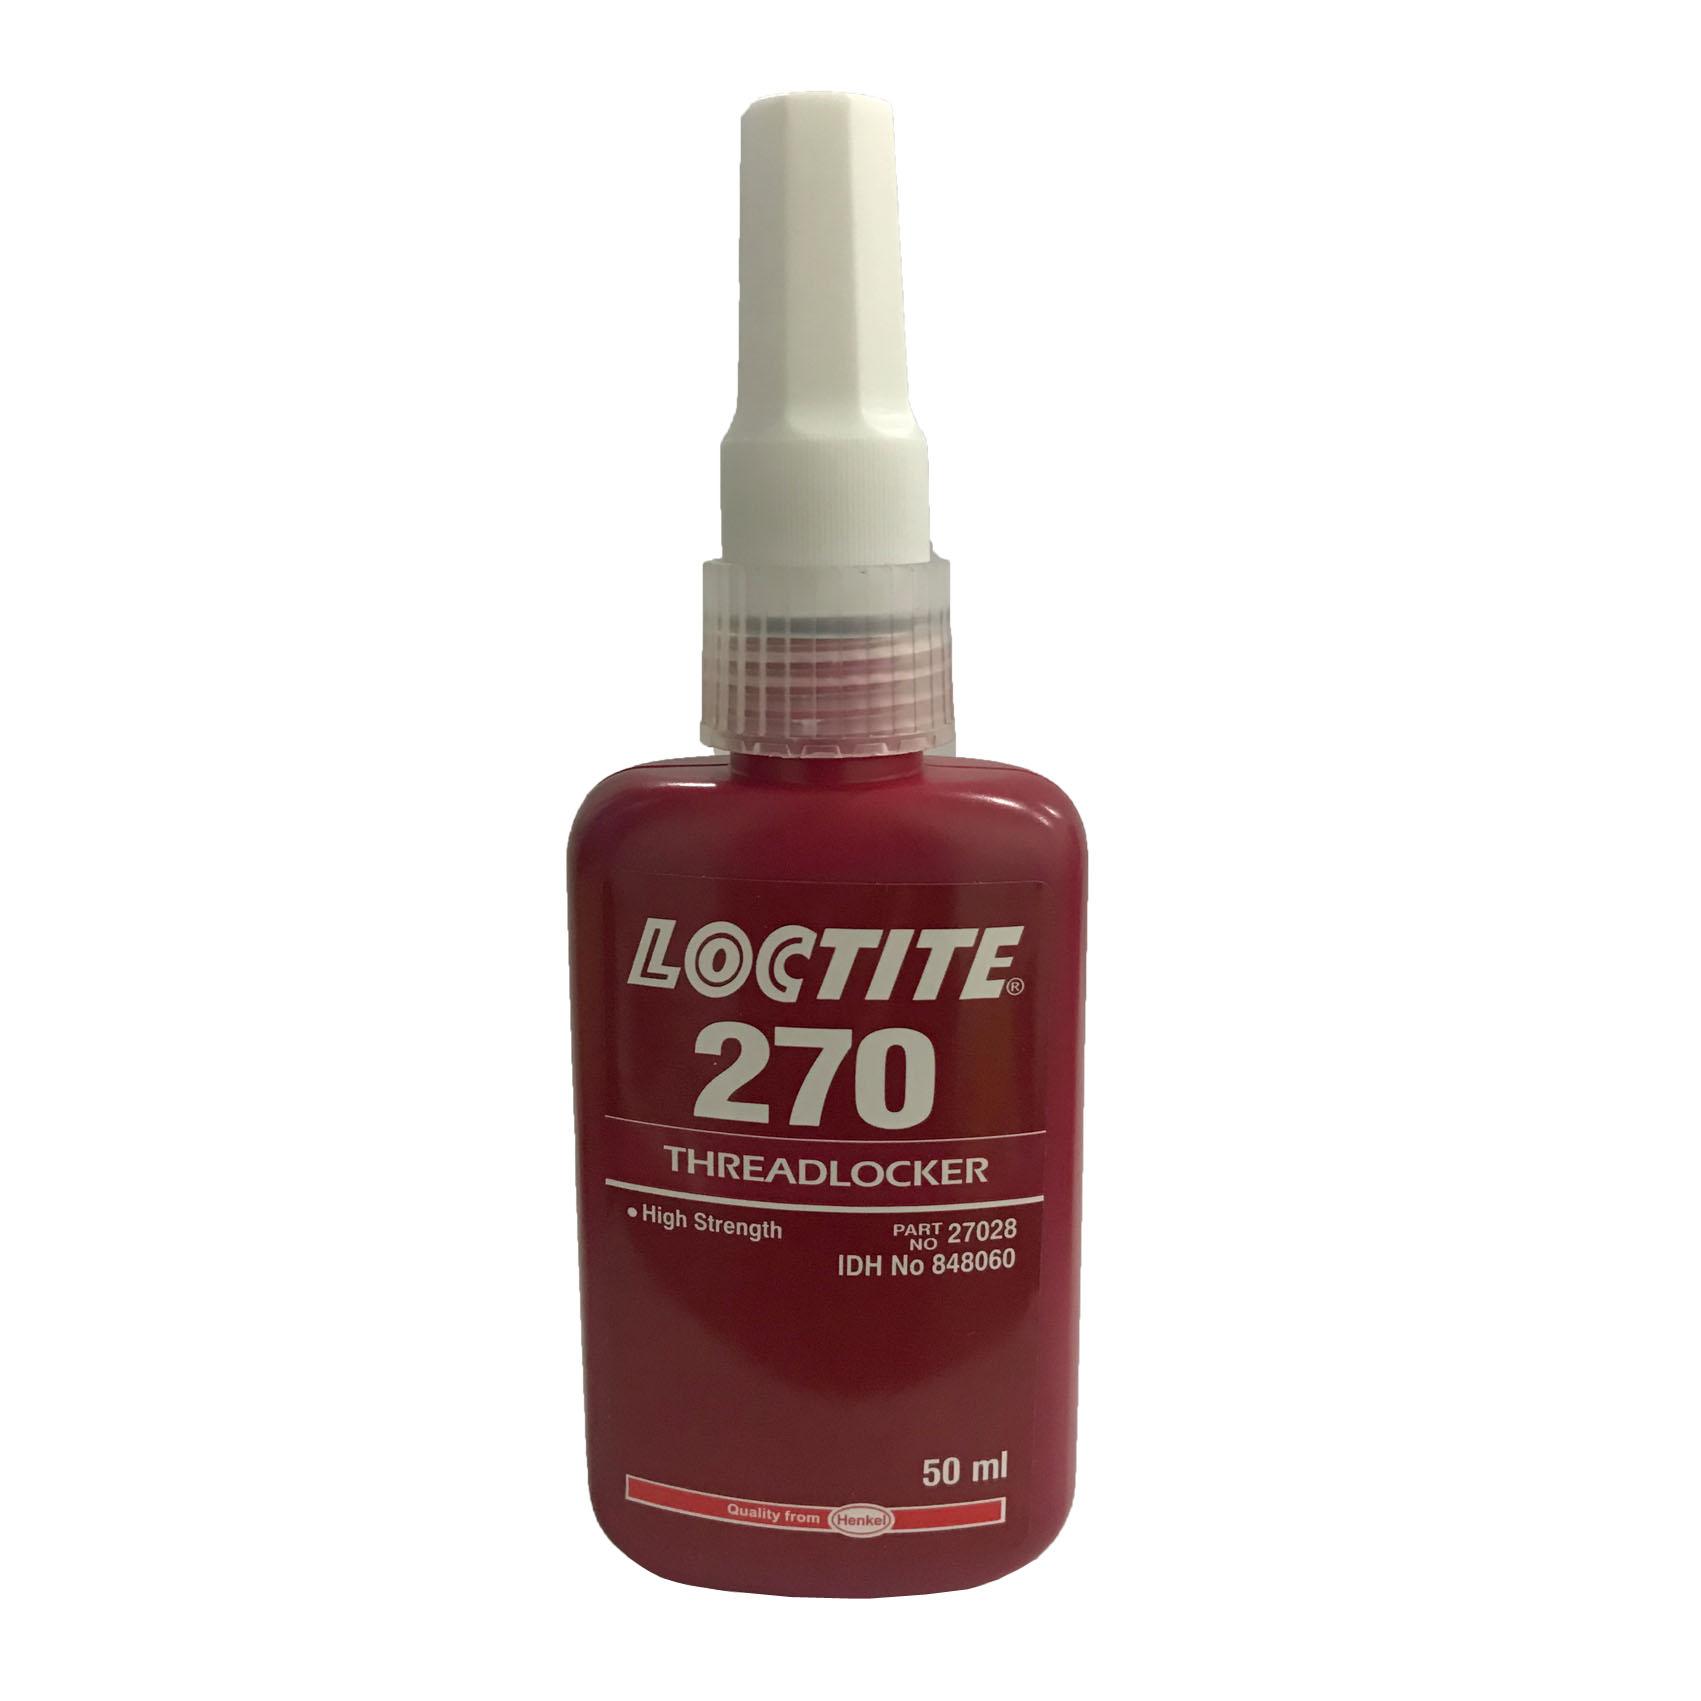 قفل رزوه ۲۷۰ لاکتایت Loctite 270